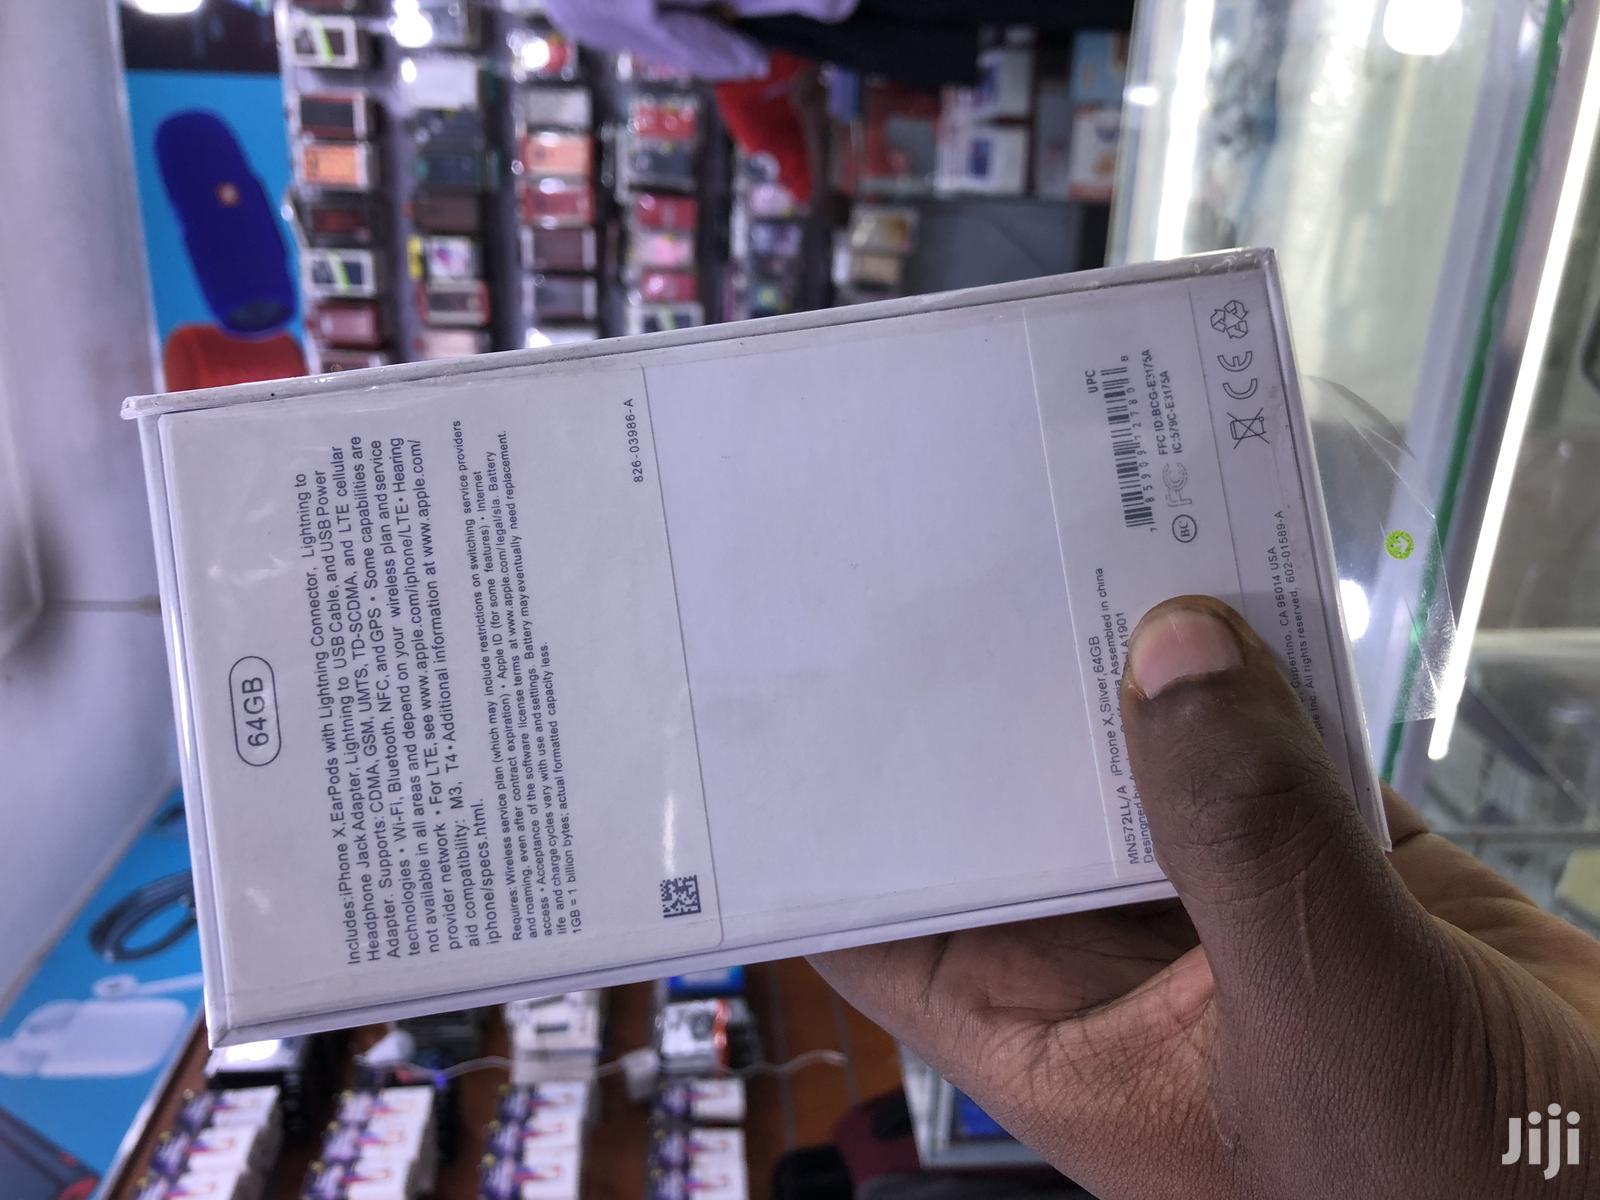 New Apple iPhone X 64 GB | Mobile Phones for sale in Kampala, Central Region, Uganda